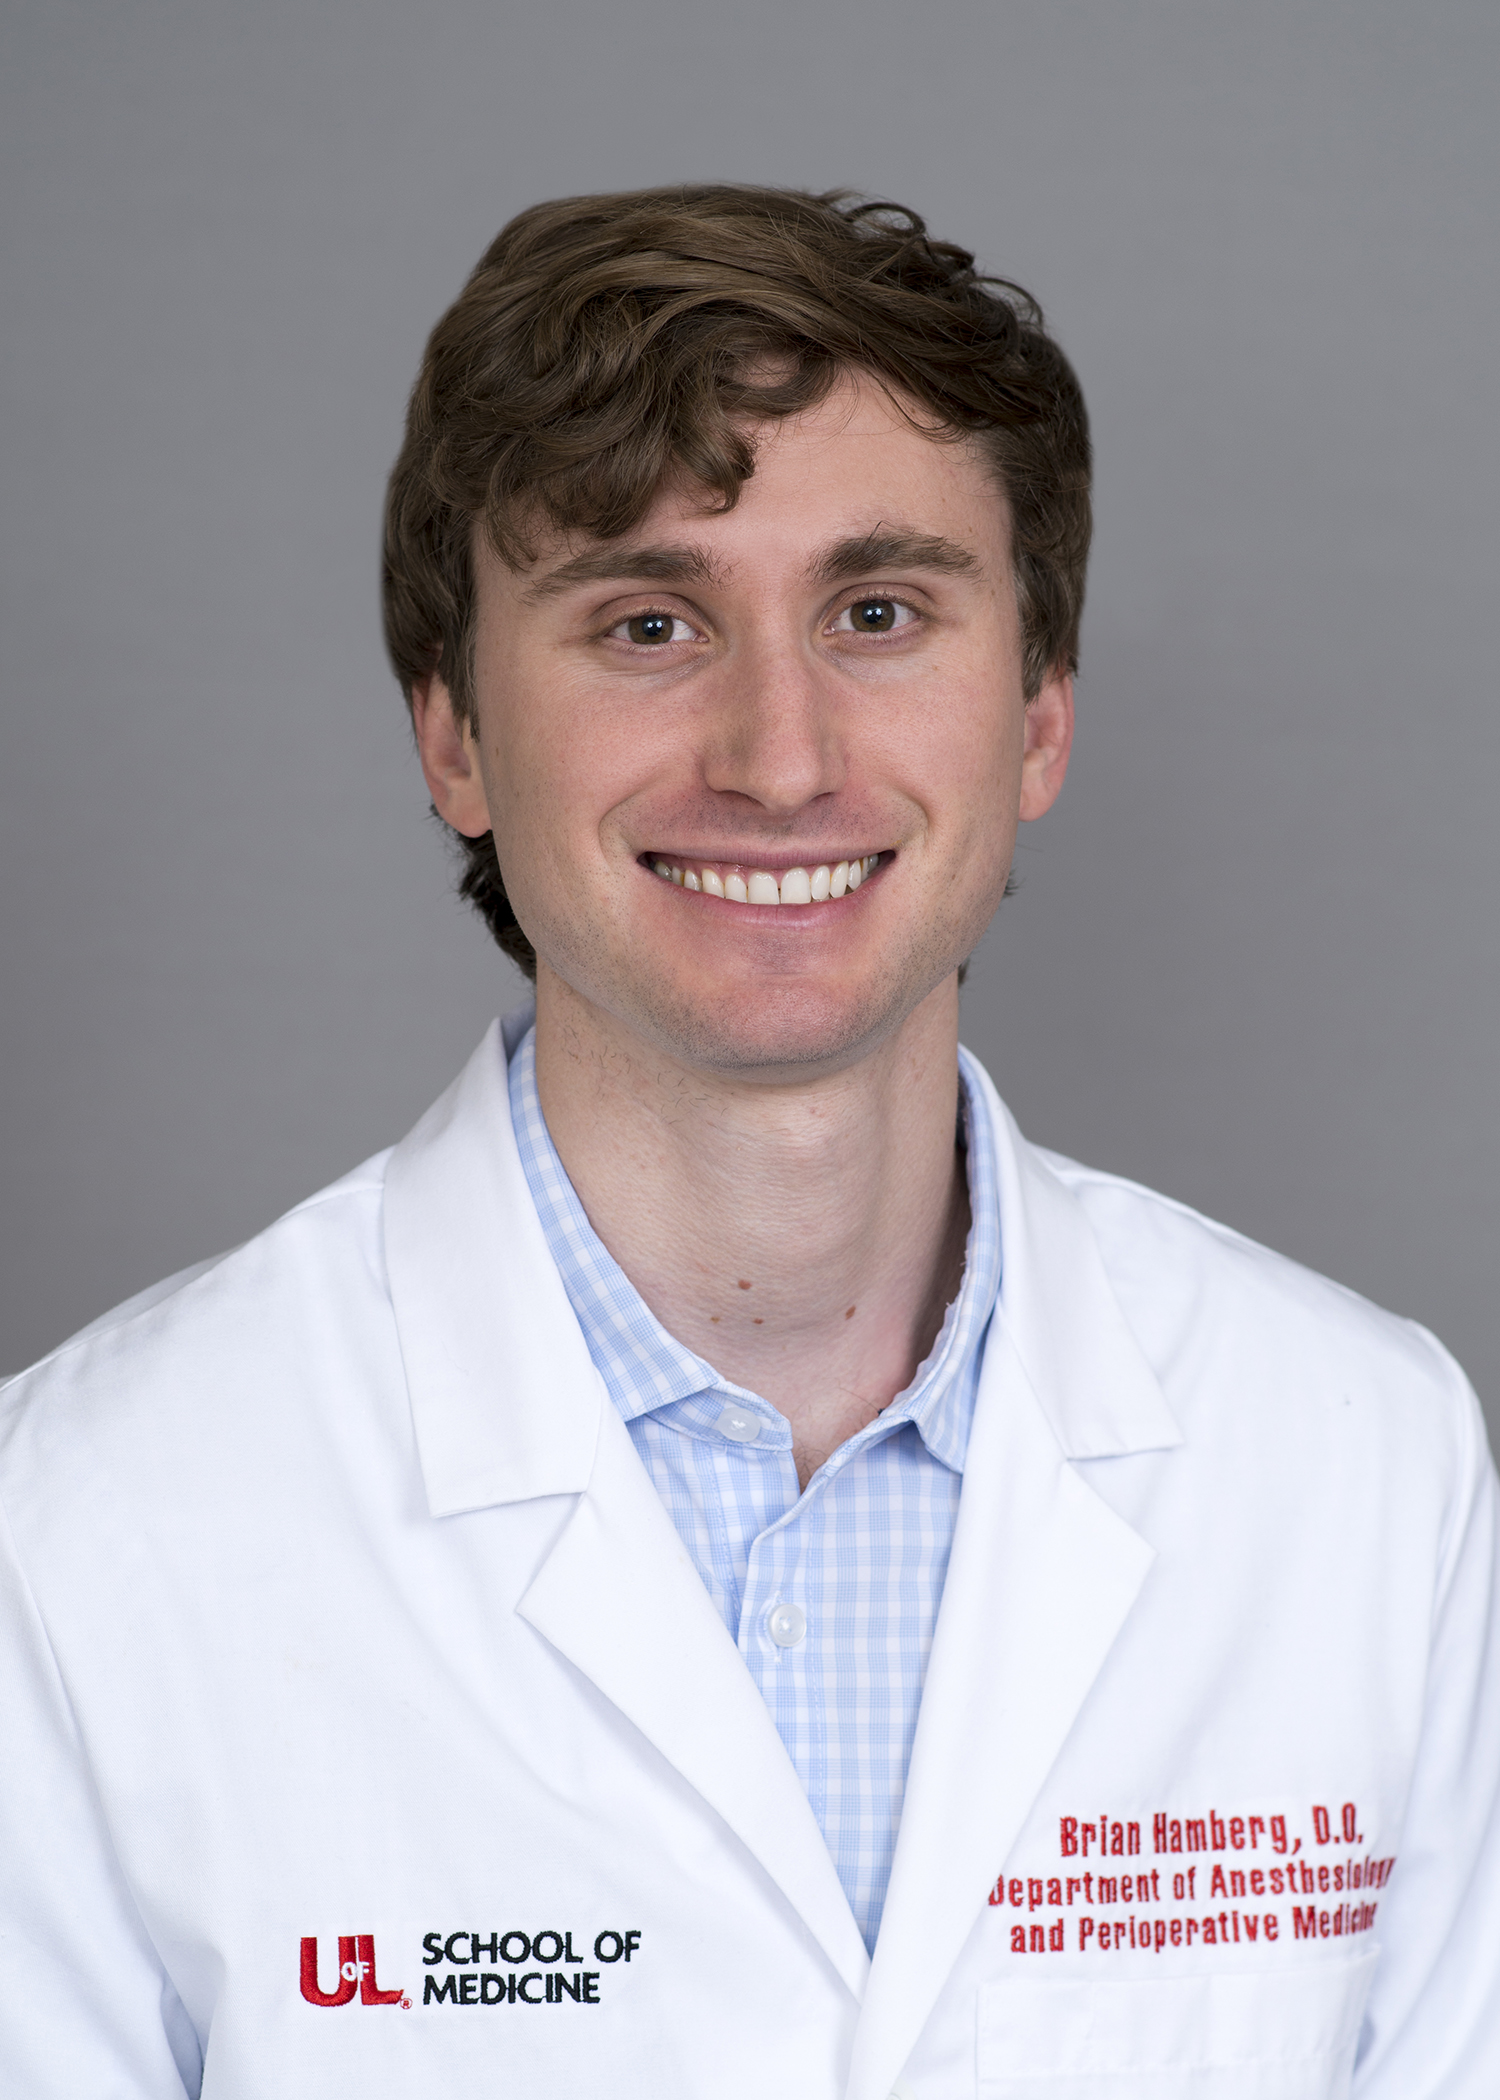 Dr. Brian Hamberg